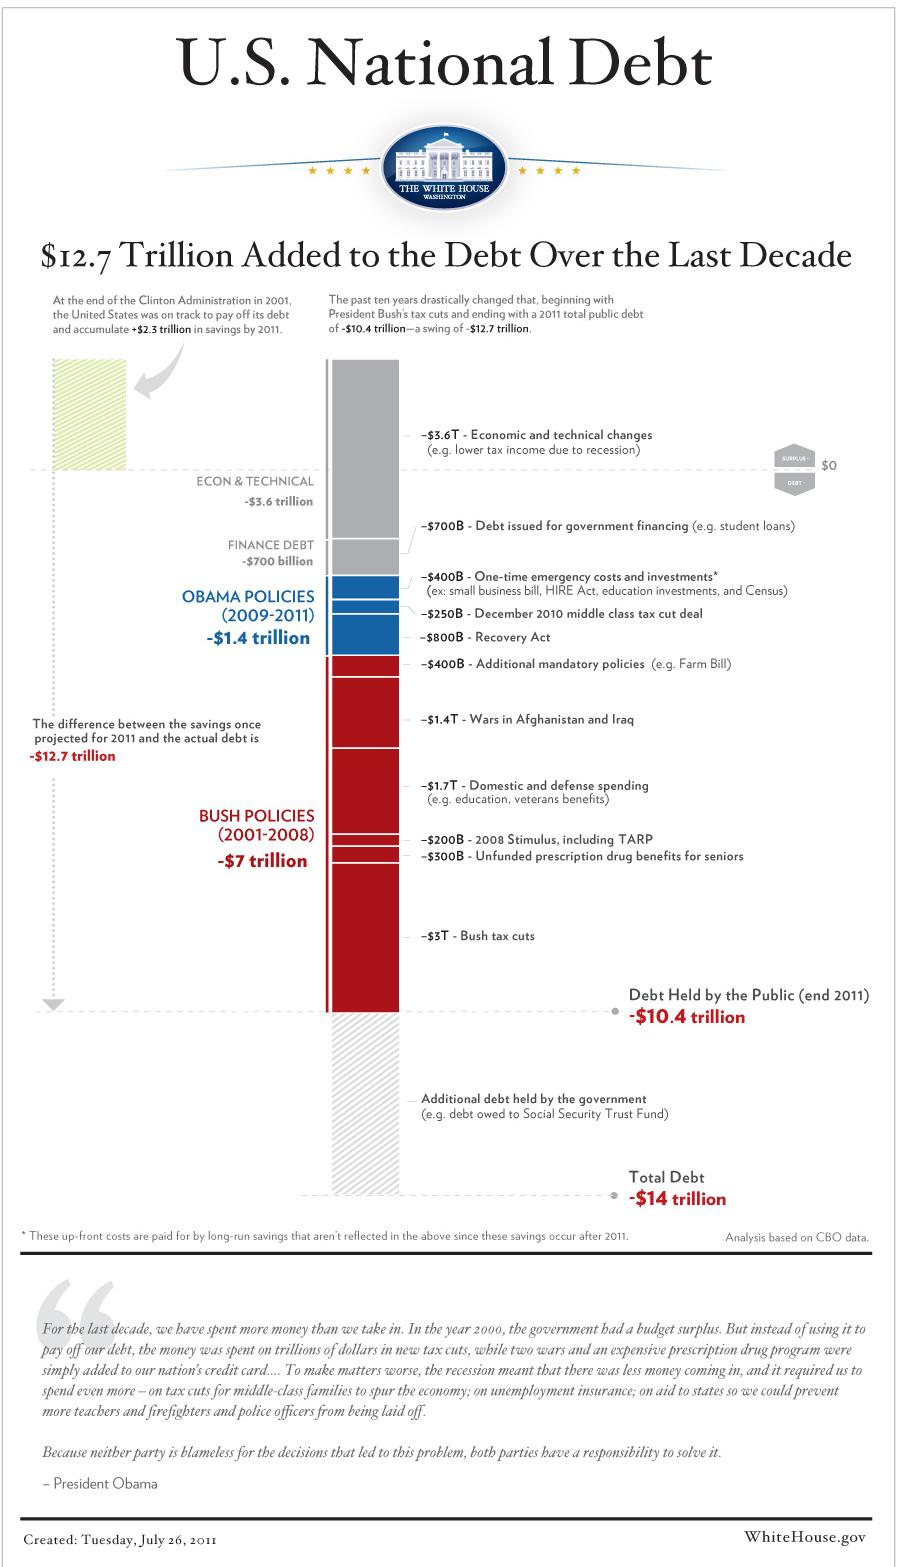 obama barack debt chart wh2 7 25 2011 texas sex offender registry the sex guys crave